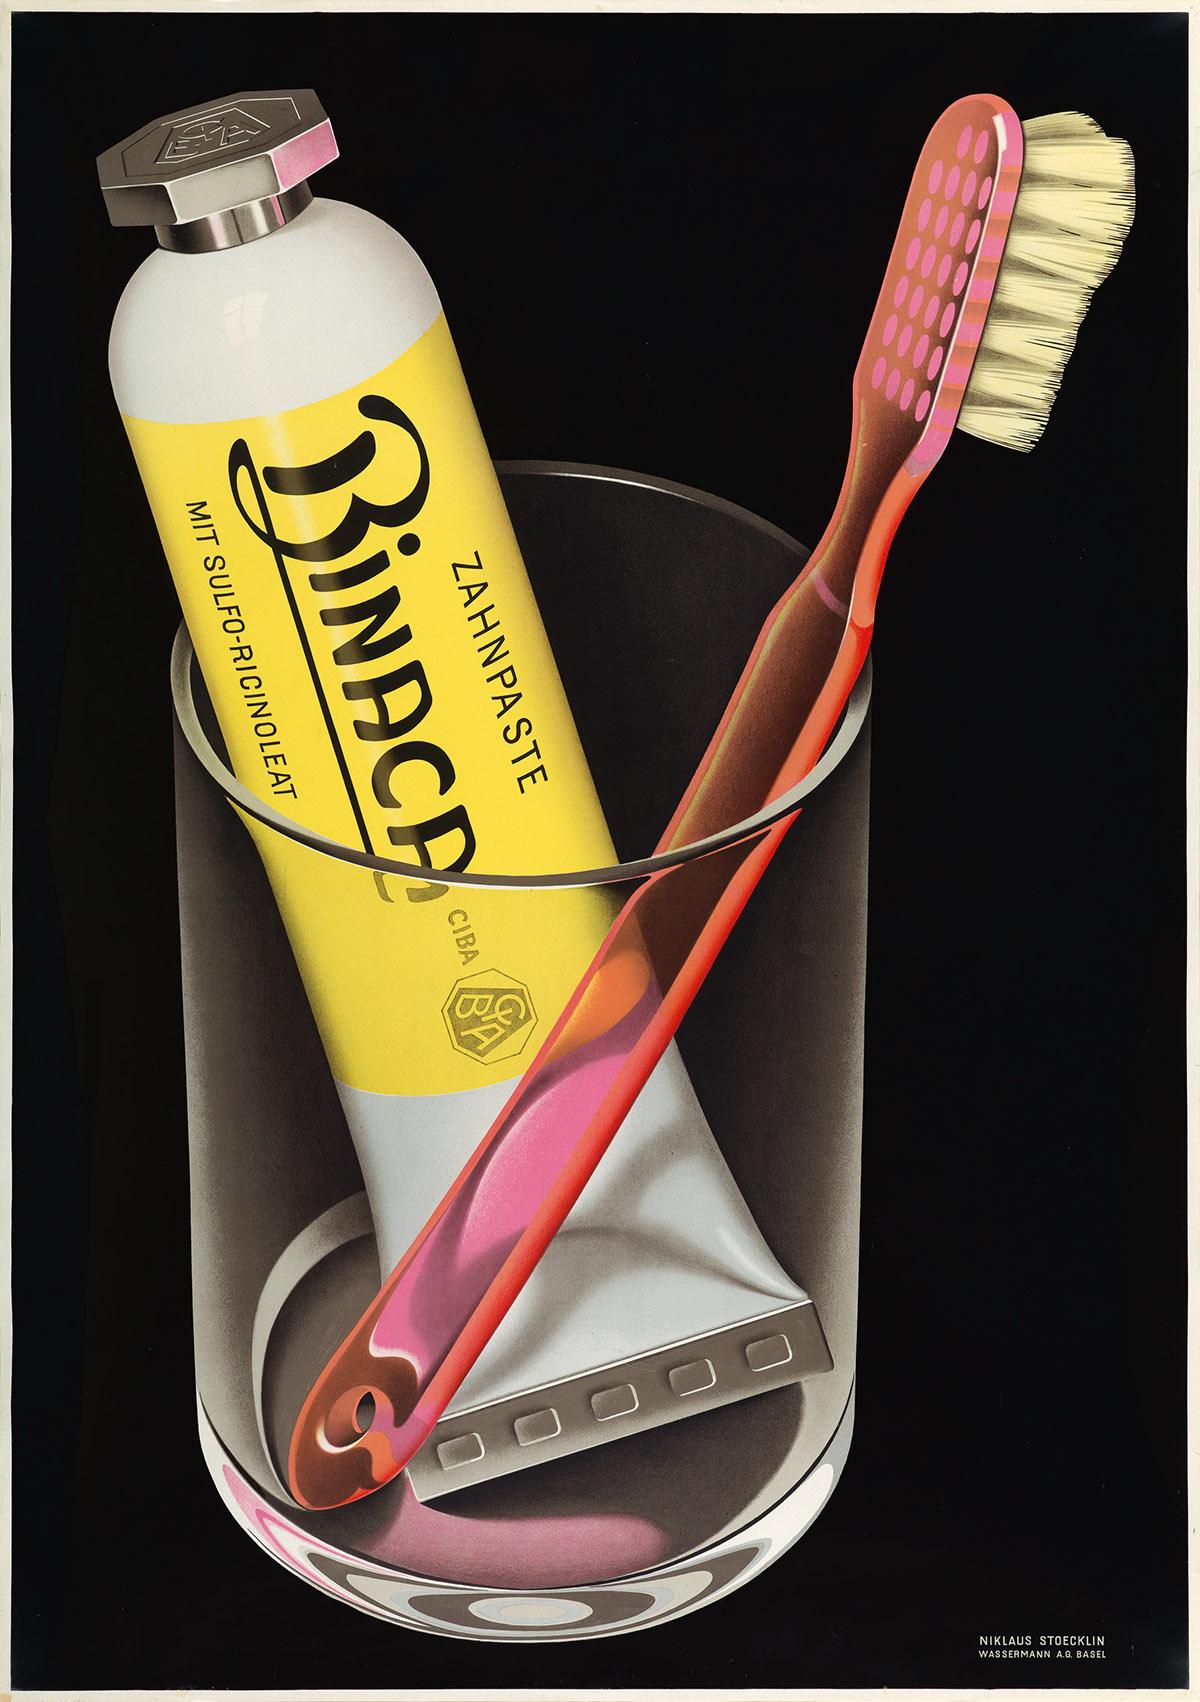 NIKLAUS STOECKLIN (1896-1982). BINACA. 1941. 50x35 inches, 127x90 cm. Wassermann, Basel.